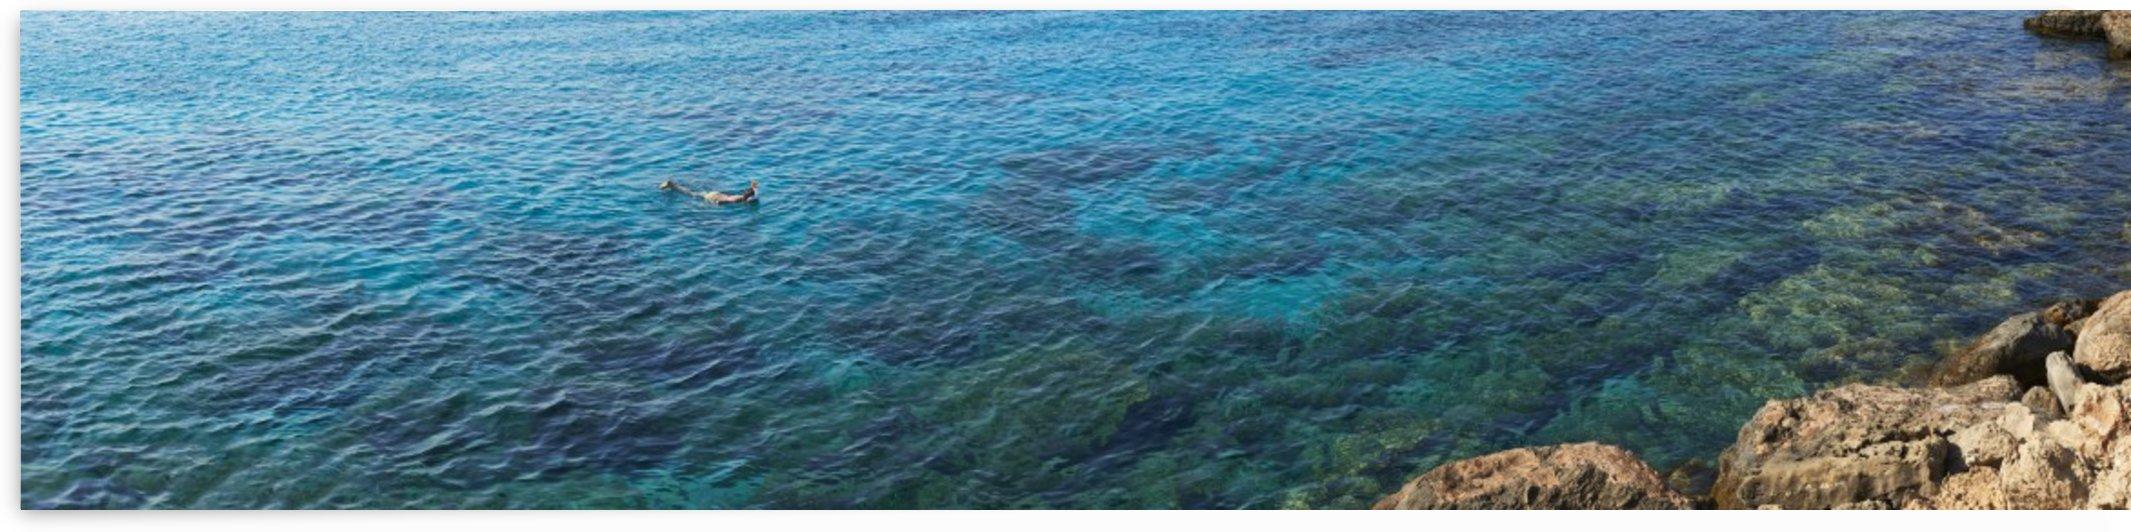 Snorkeling by Adrian Brockwell